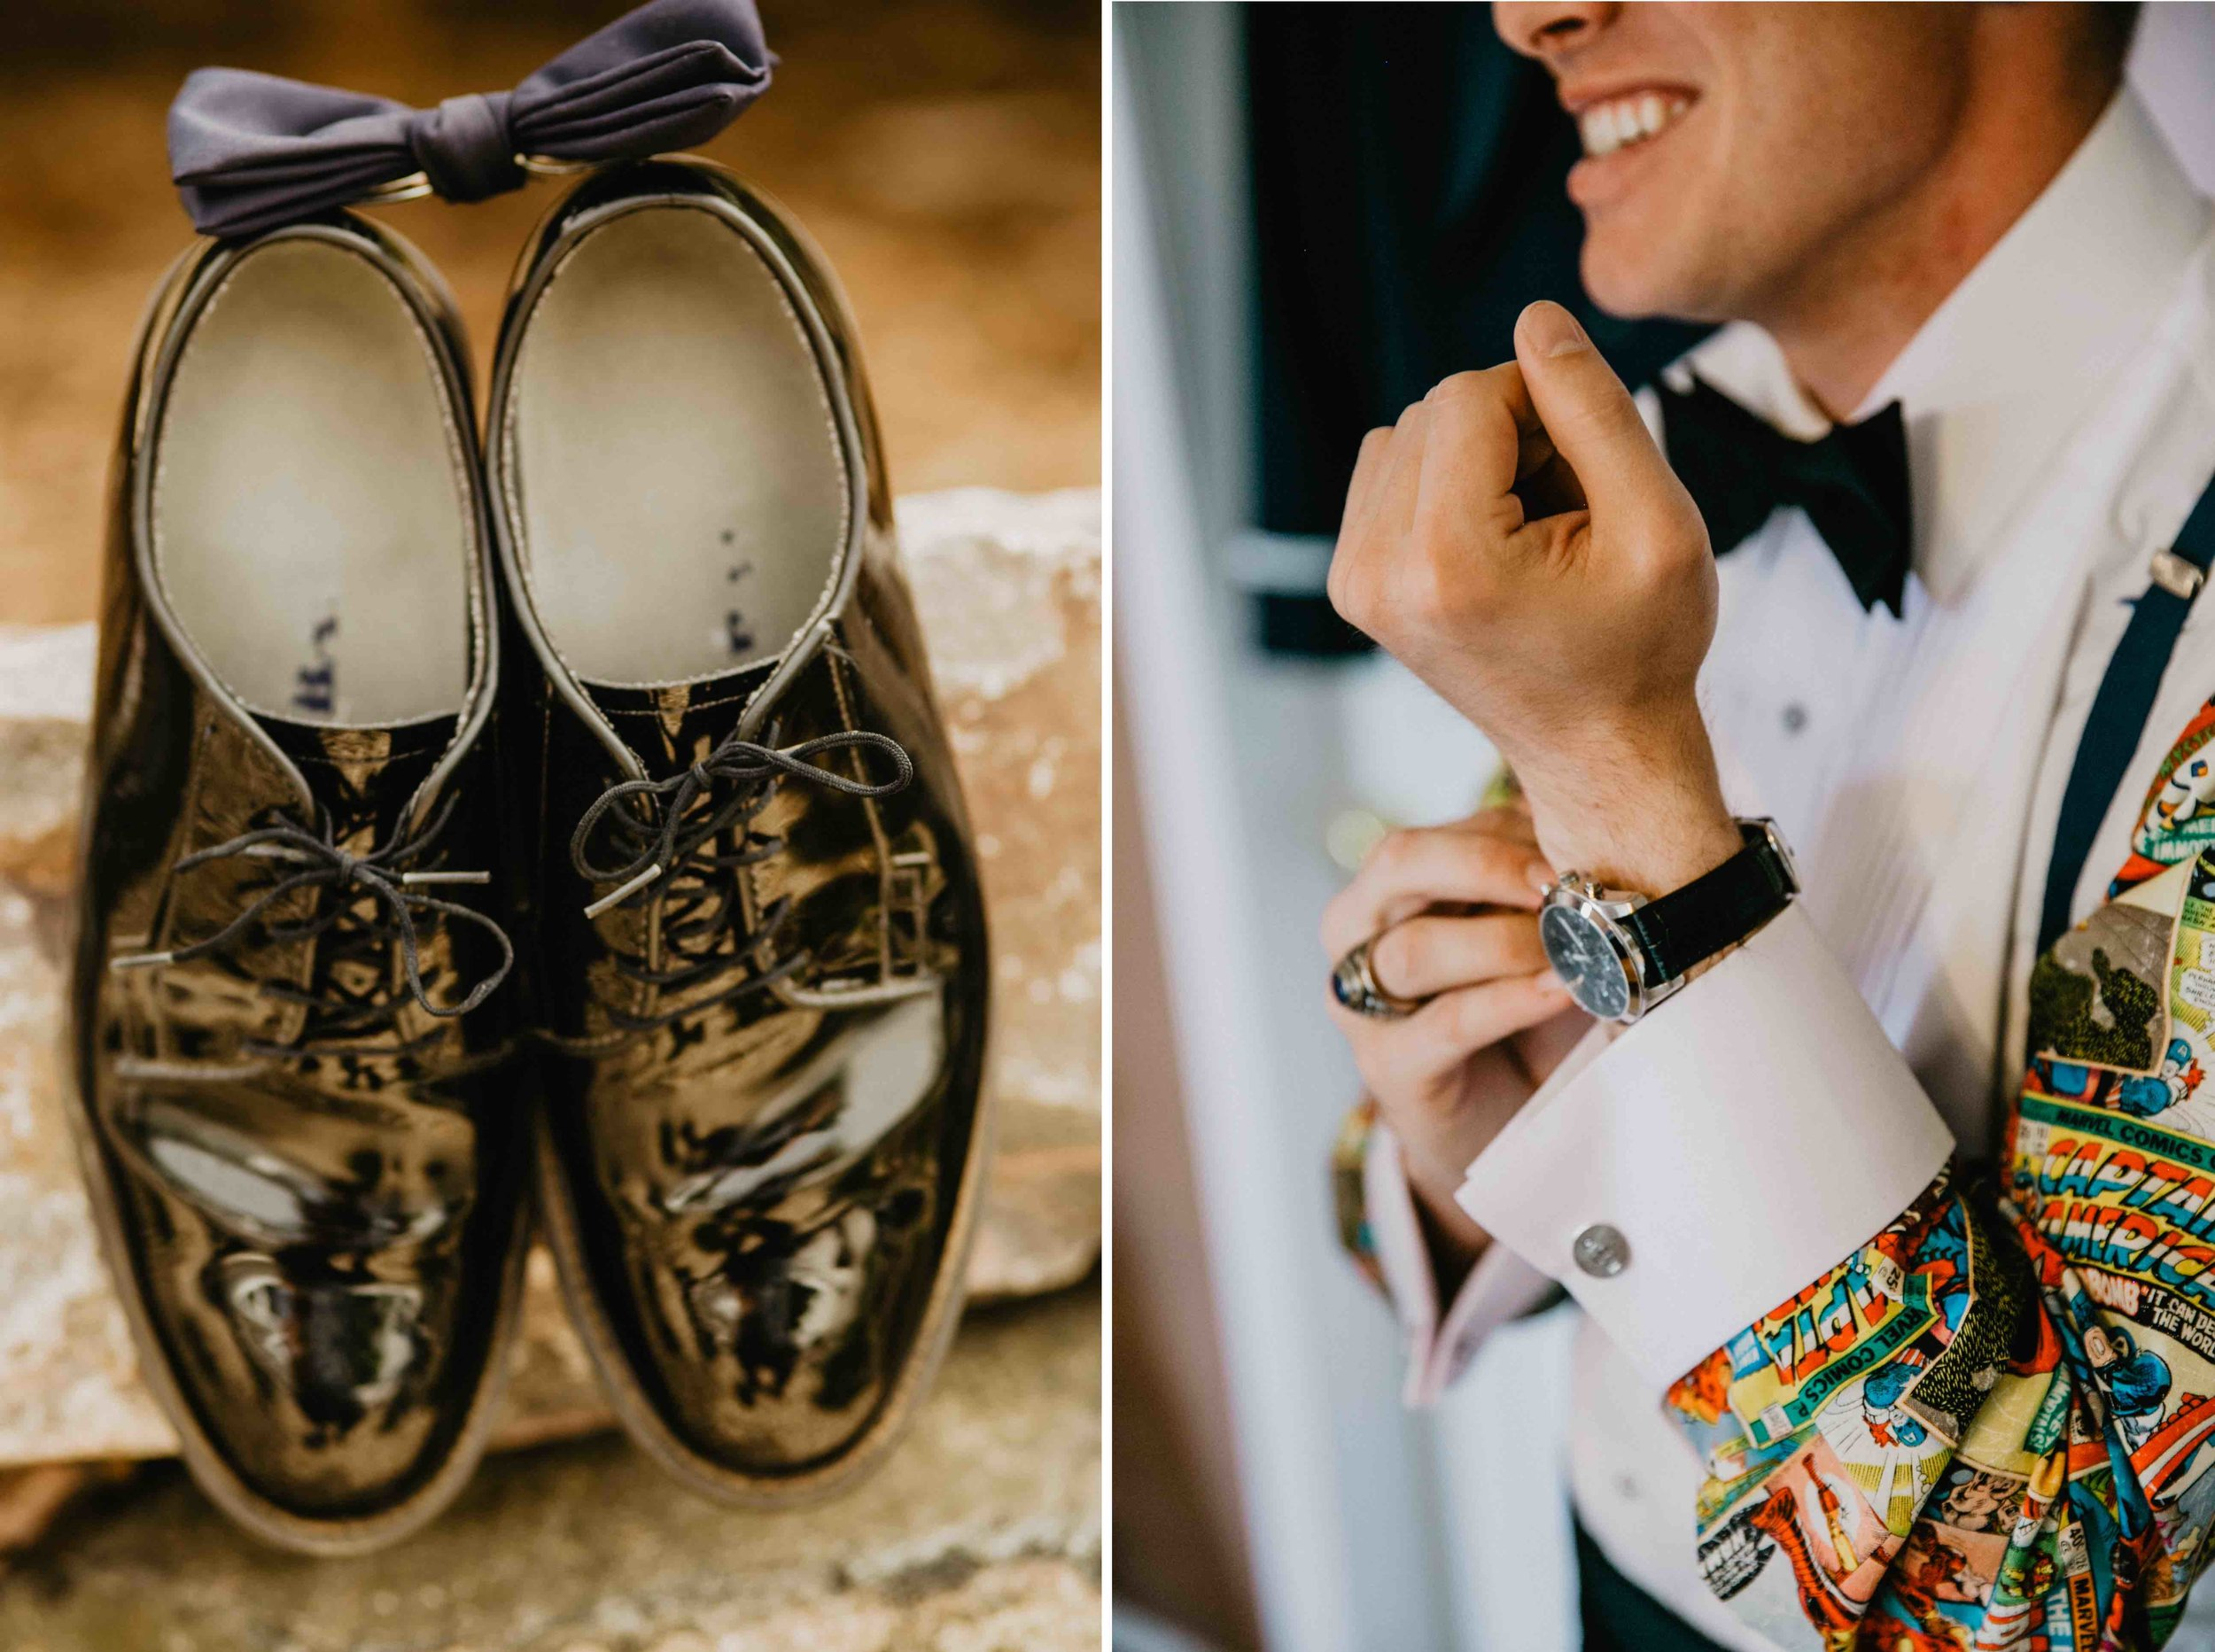 IMG_1455-colorado-wedding-photographer-denver-springs-vail--colorado-wedding-photographer-denver-springs-vail-.jpeg